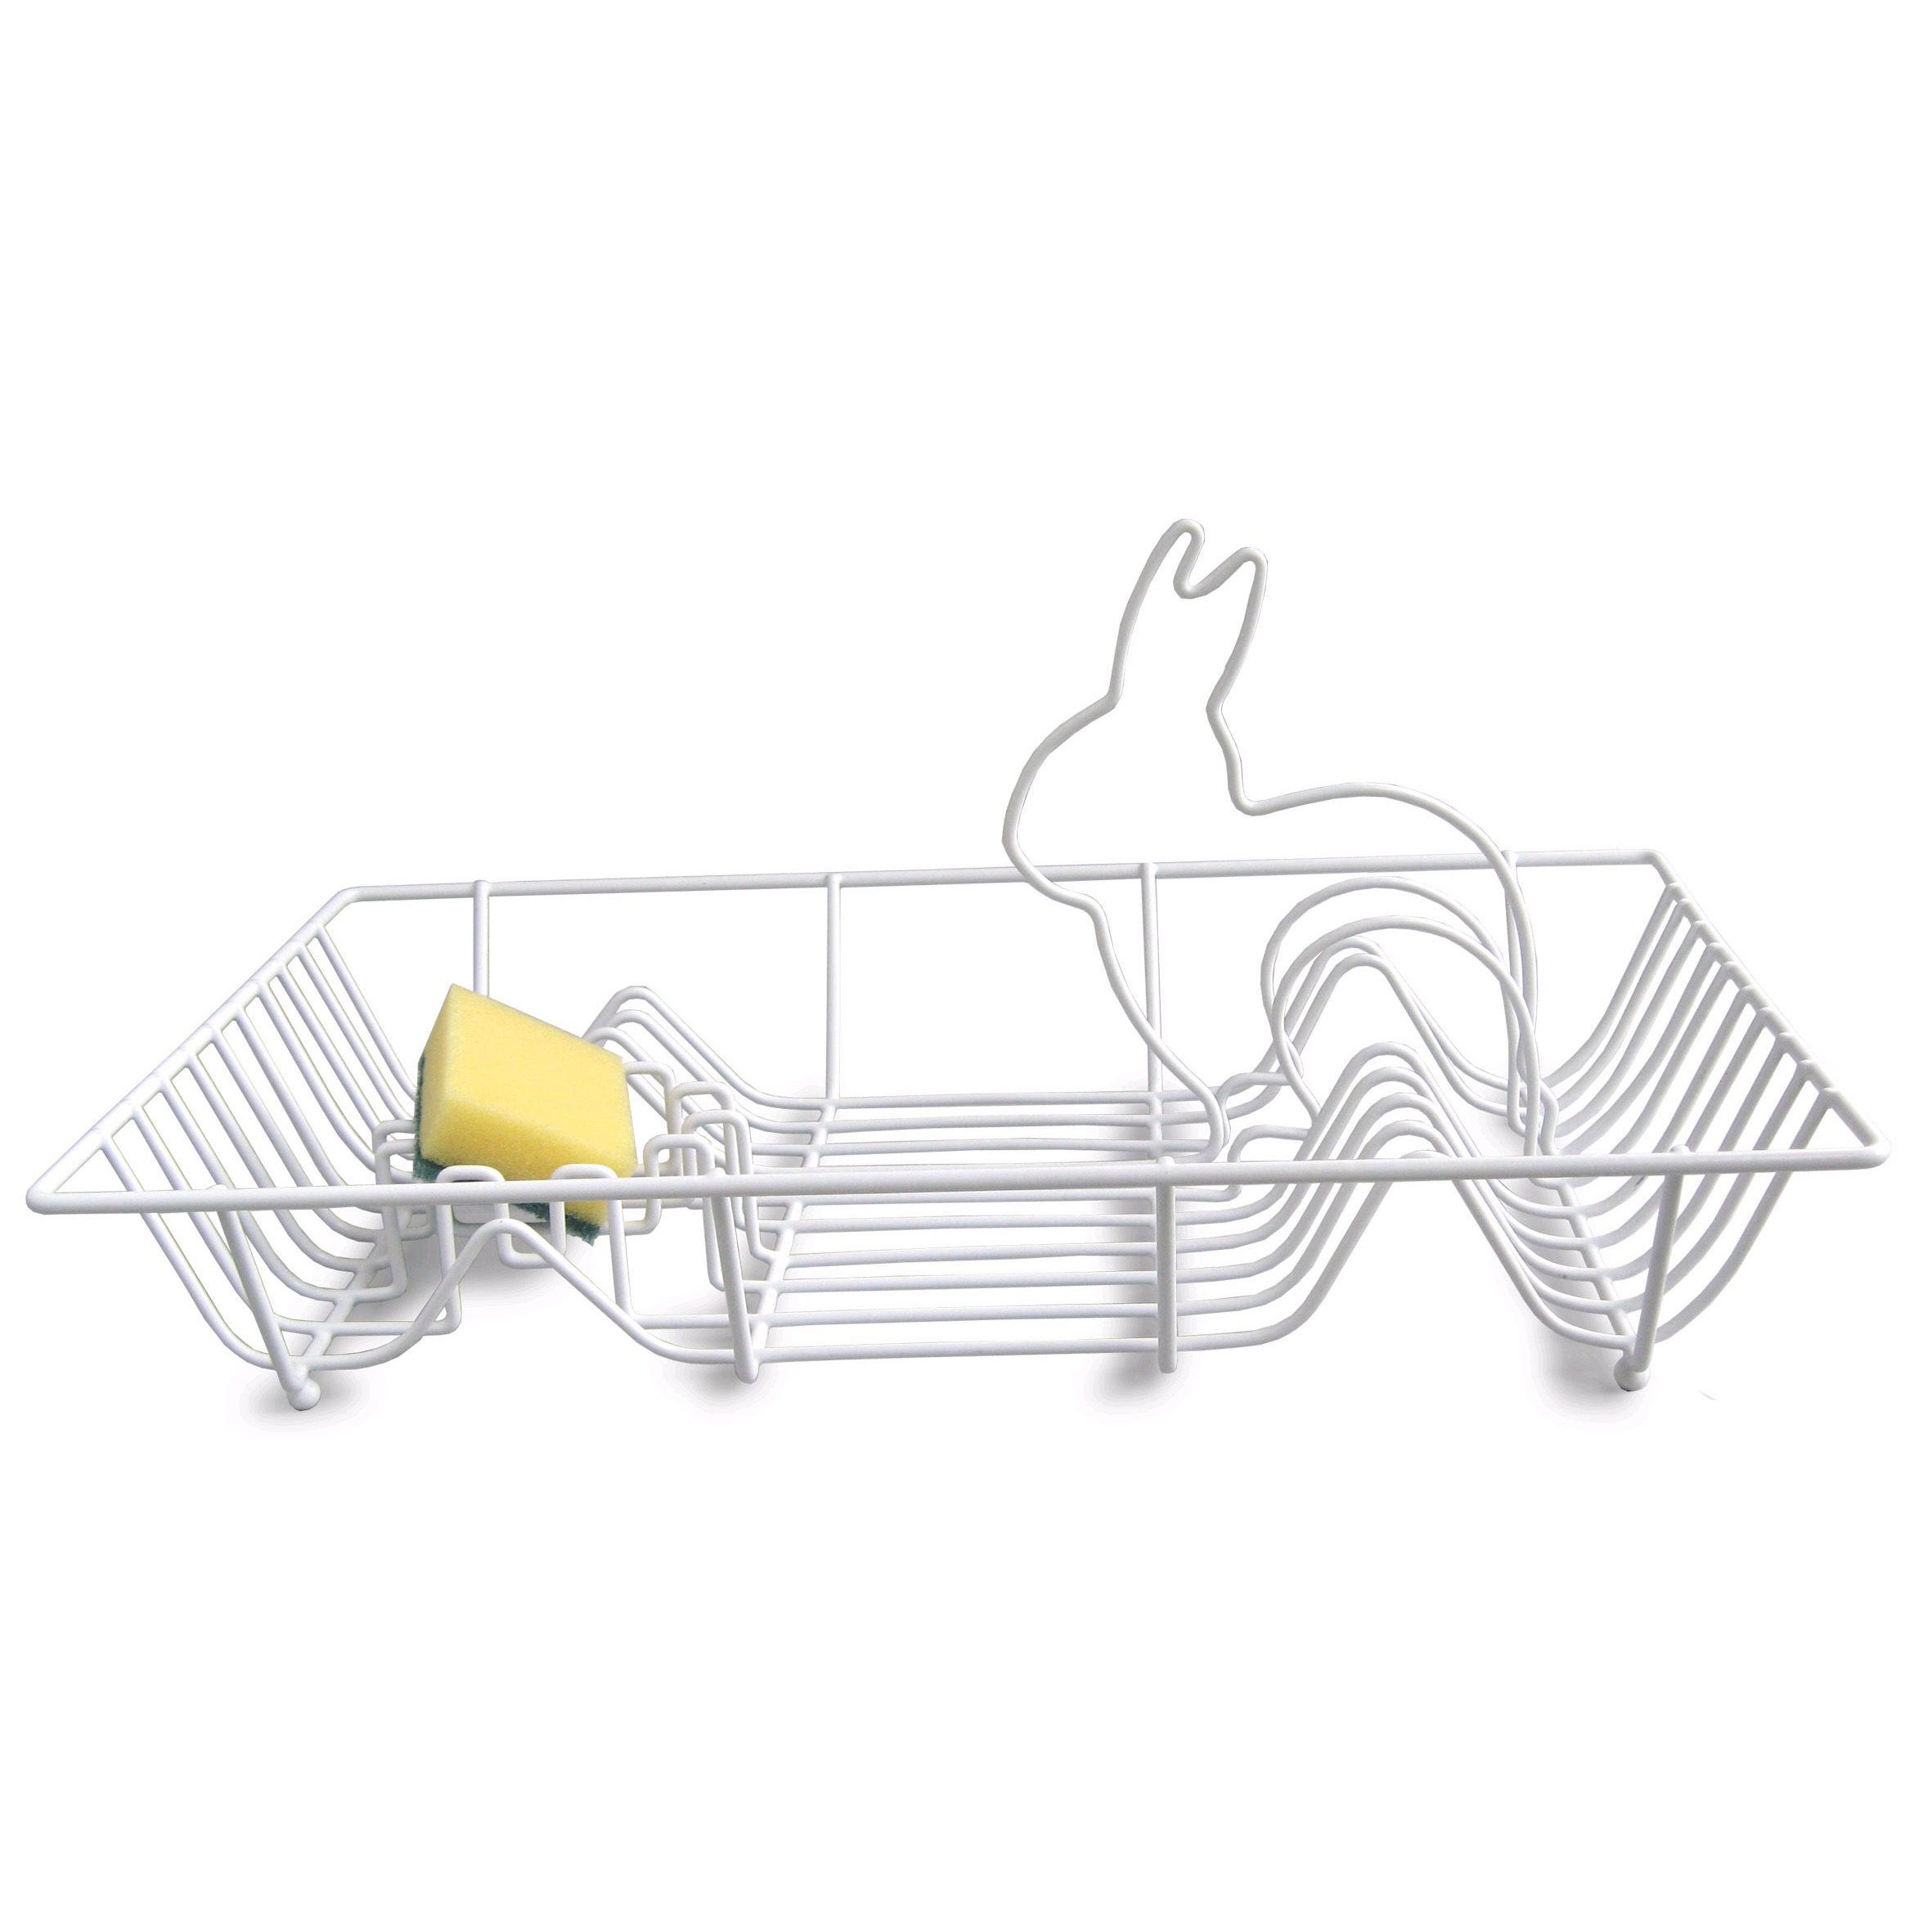 Bunny Dish Drying Rack We Ve Heard Of Dust Bunnies But